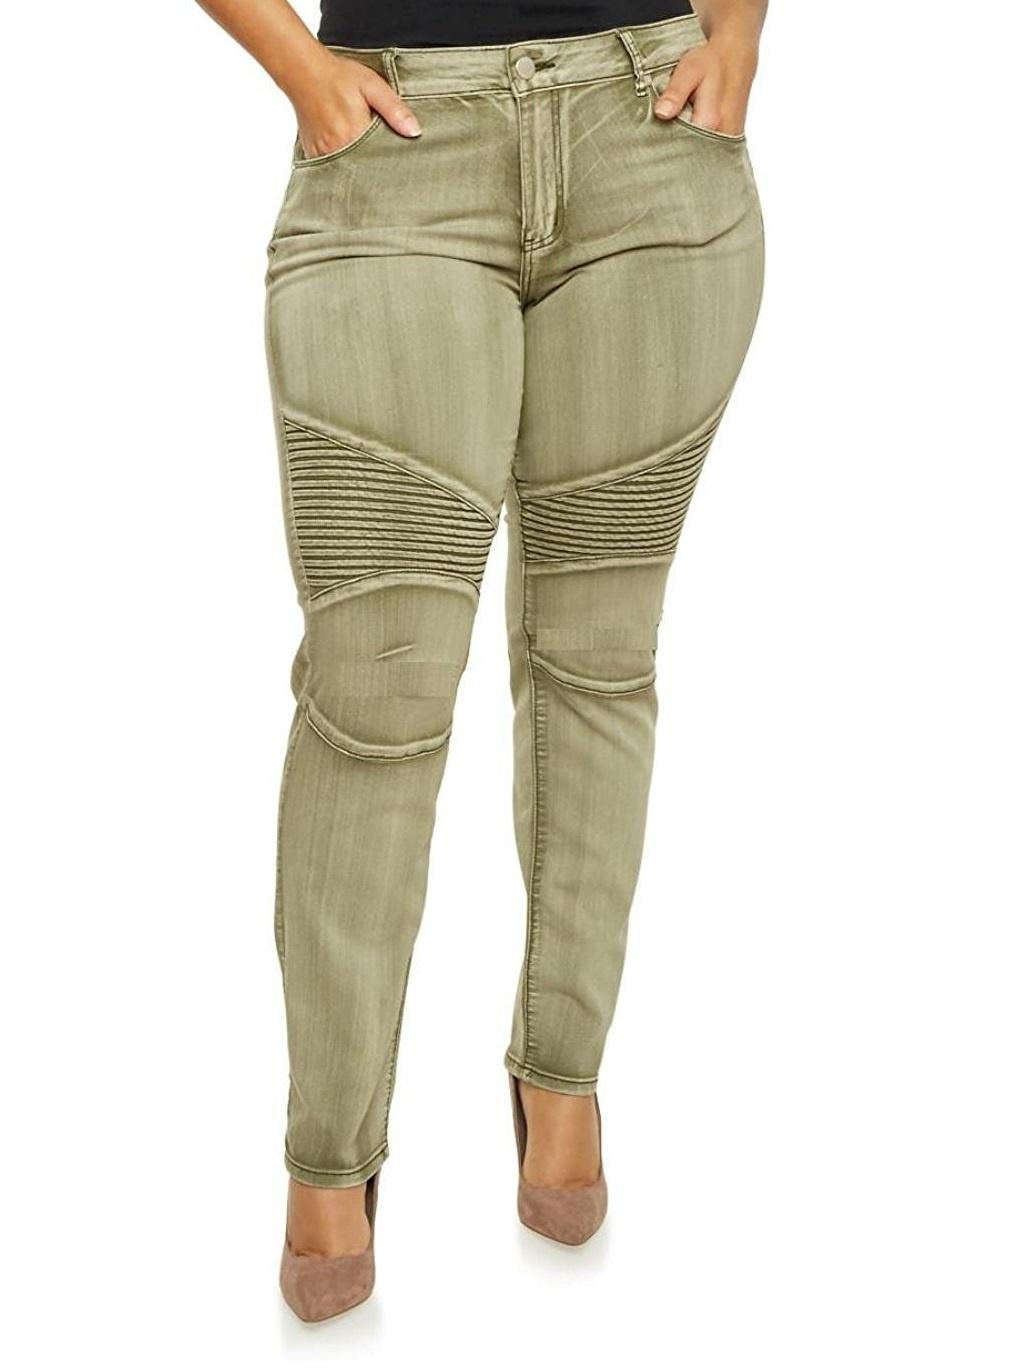 Jack David Women's Plus Size Moto Biker Stretch Skinny Denim Jeans Pants Y1648